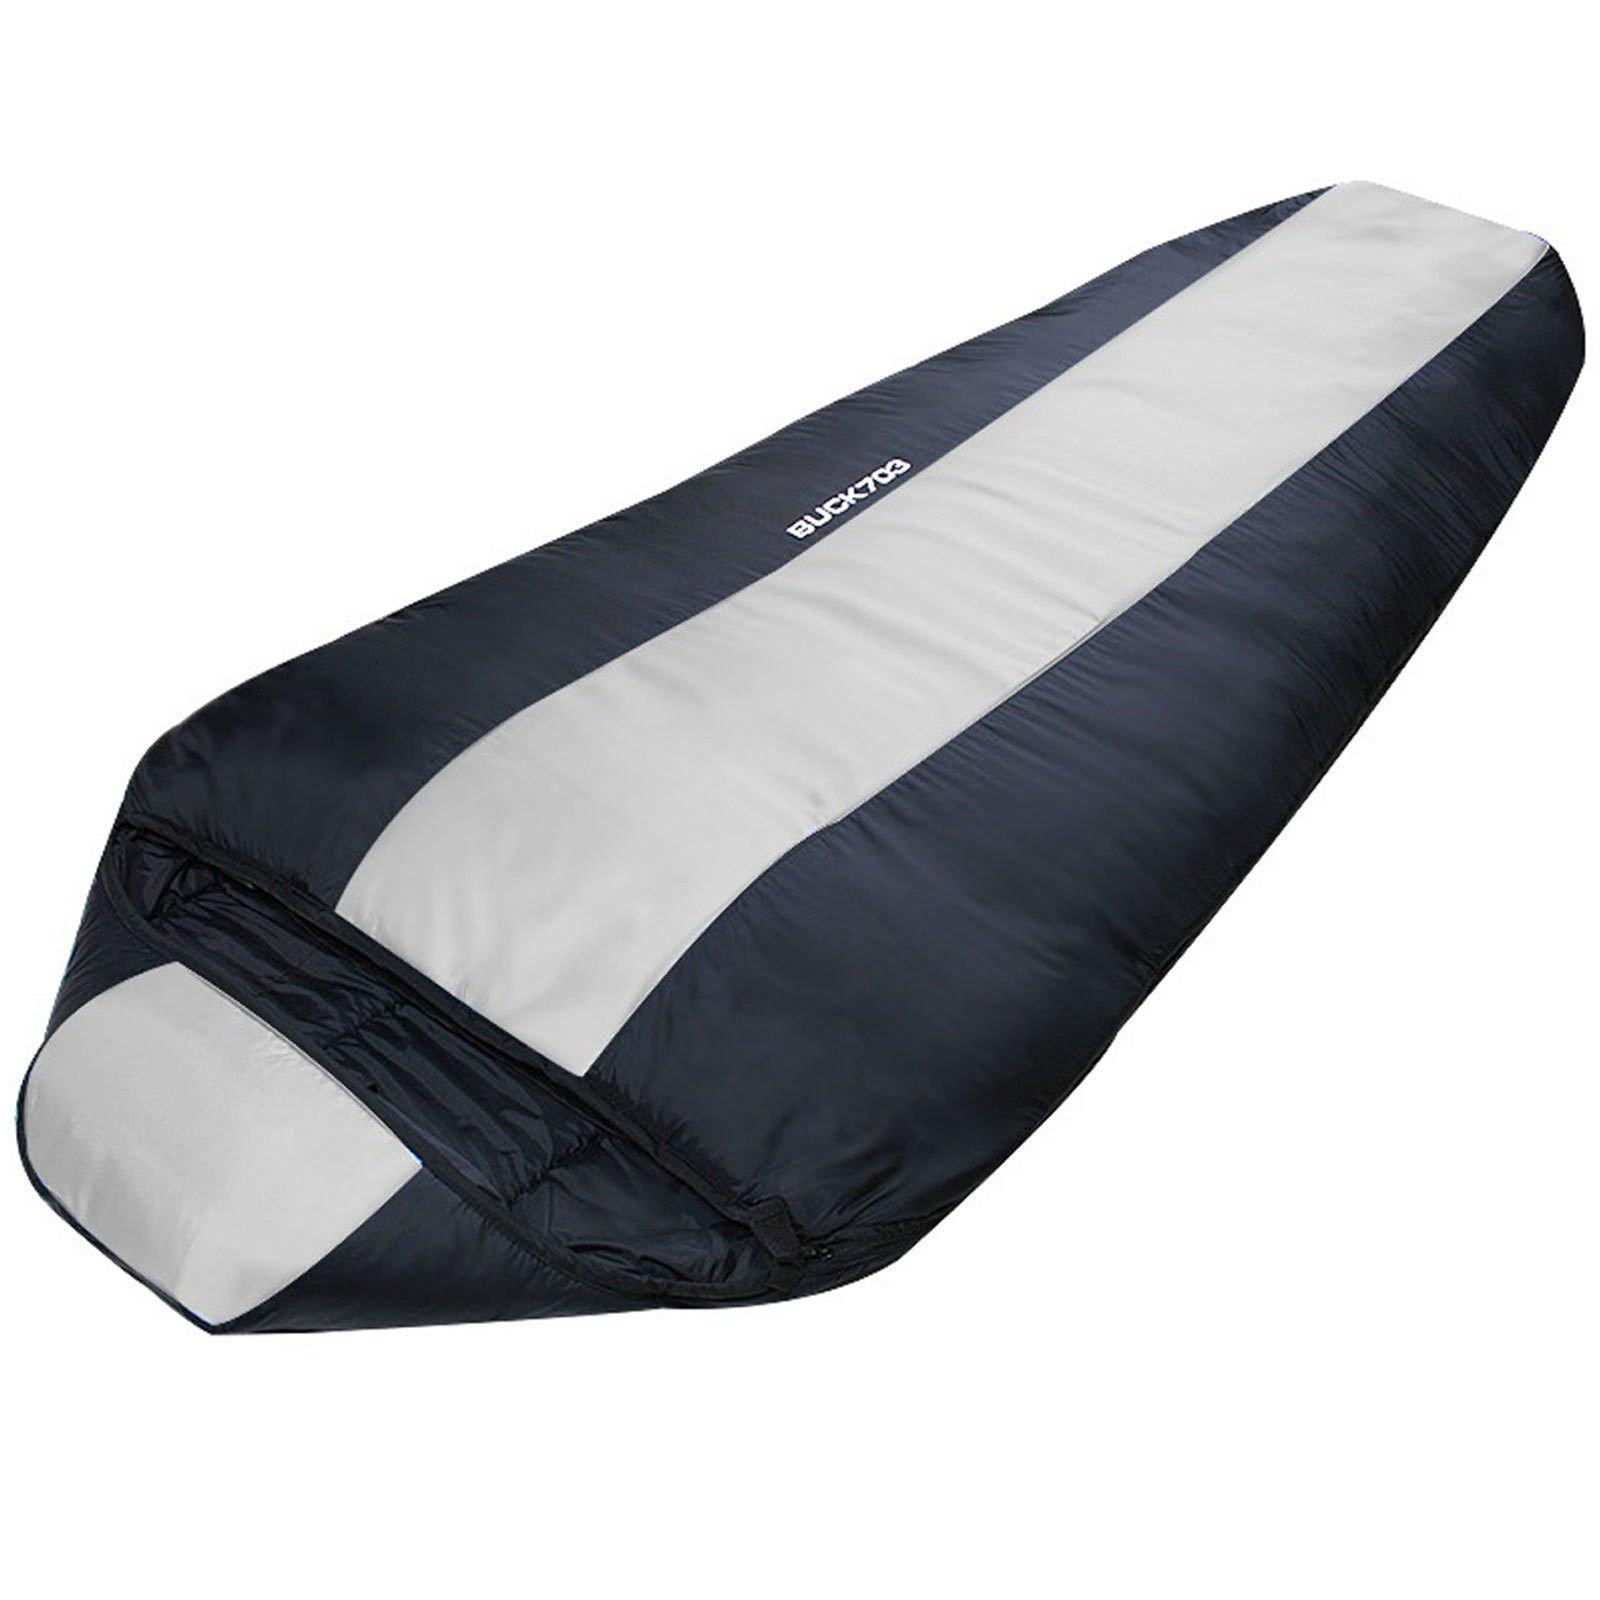 Big Sleeping Bag Large Size 225Cm Lightweight Camping Backpacking